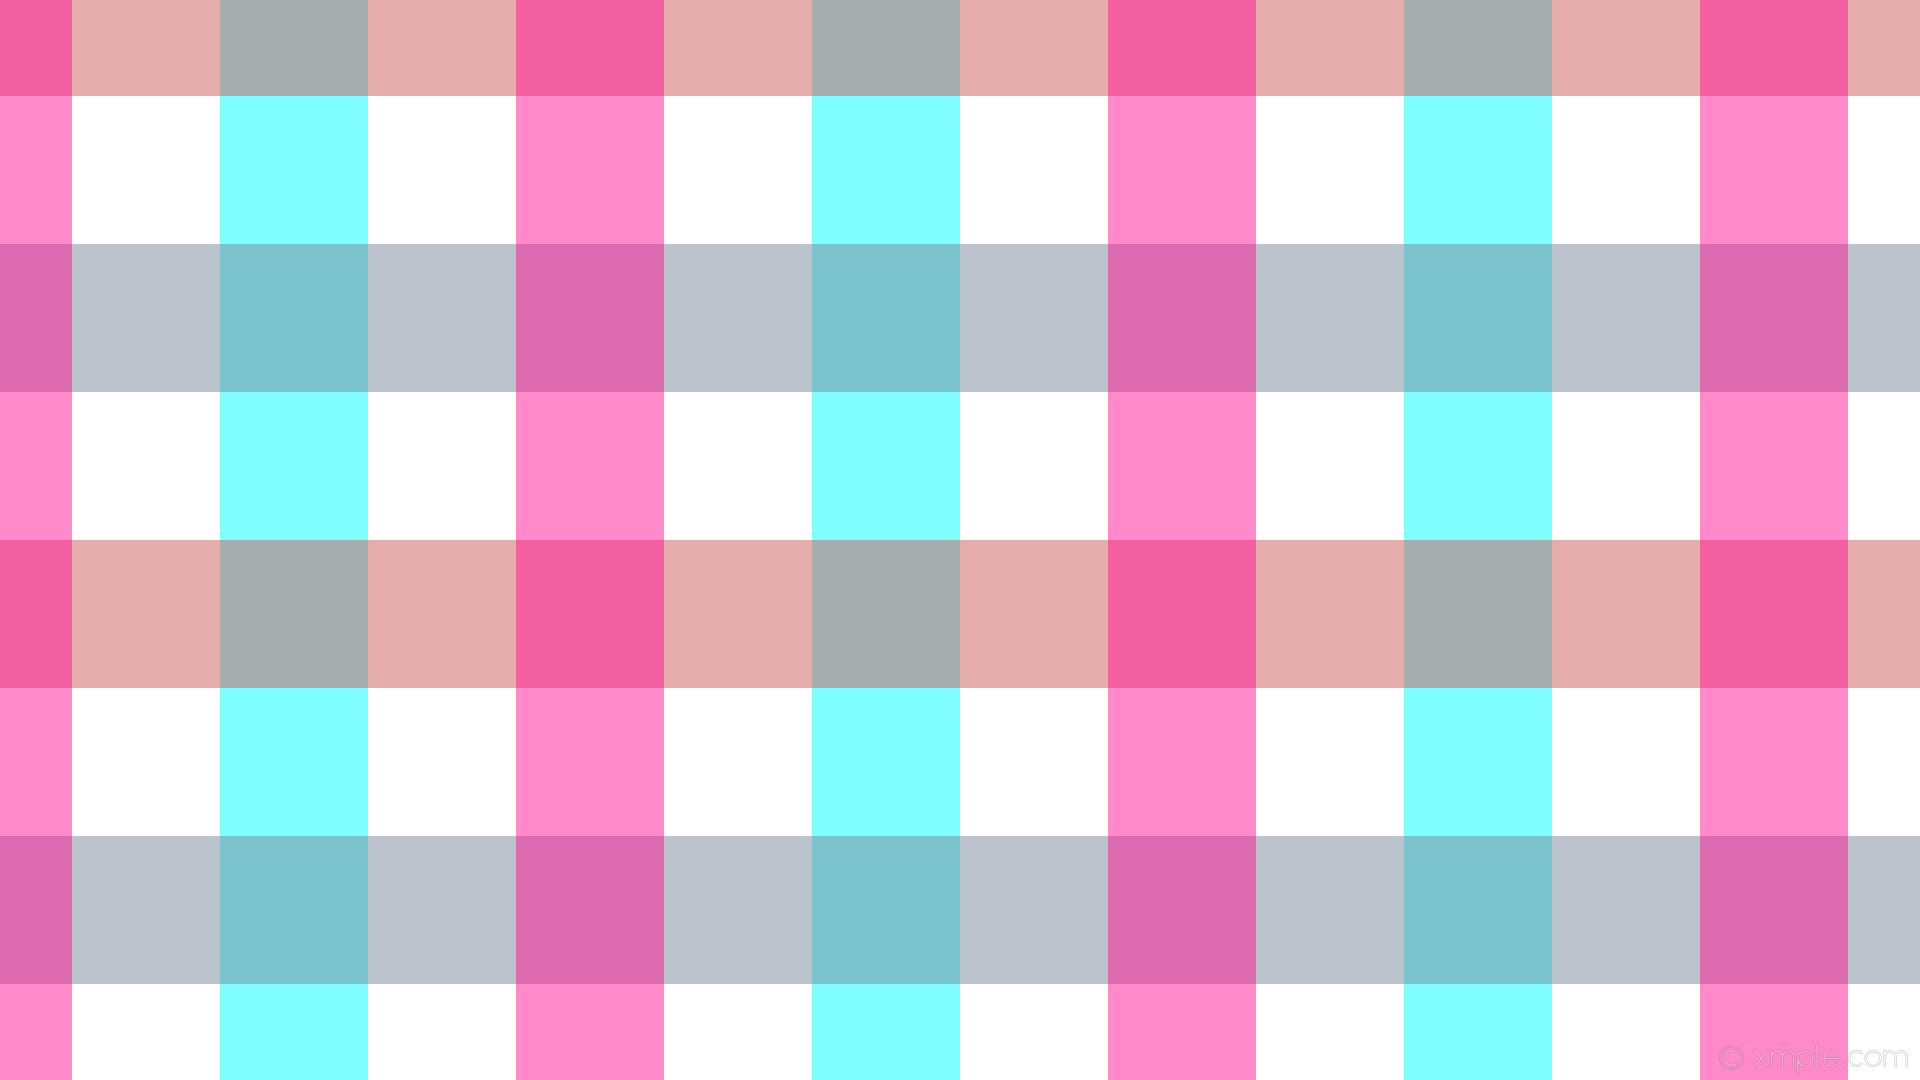 wallpaper gingham penta pink white striped grey blue red aqua cyan indian  red light slate gray